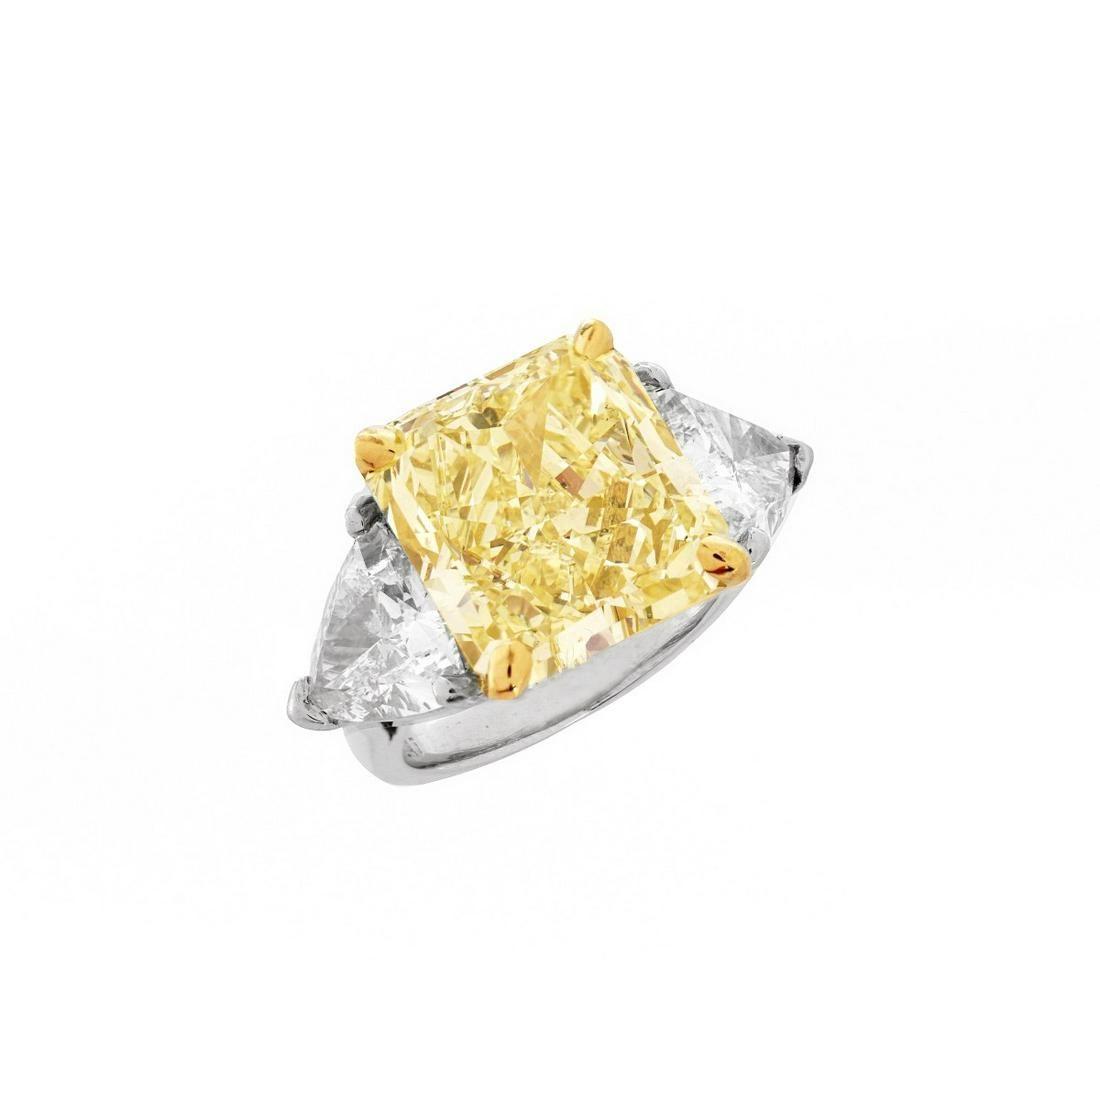 14.71ct Fancy Yellow Diamond Engagement Ring